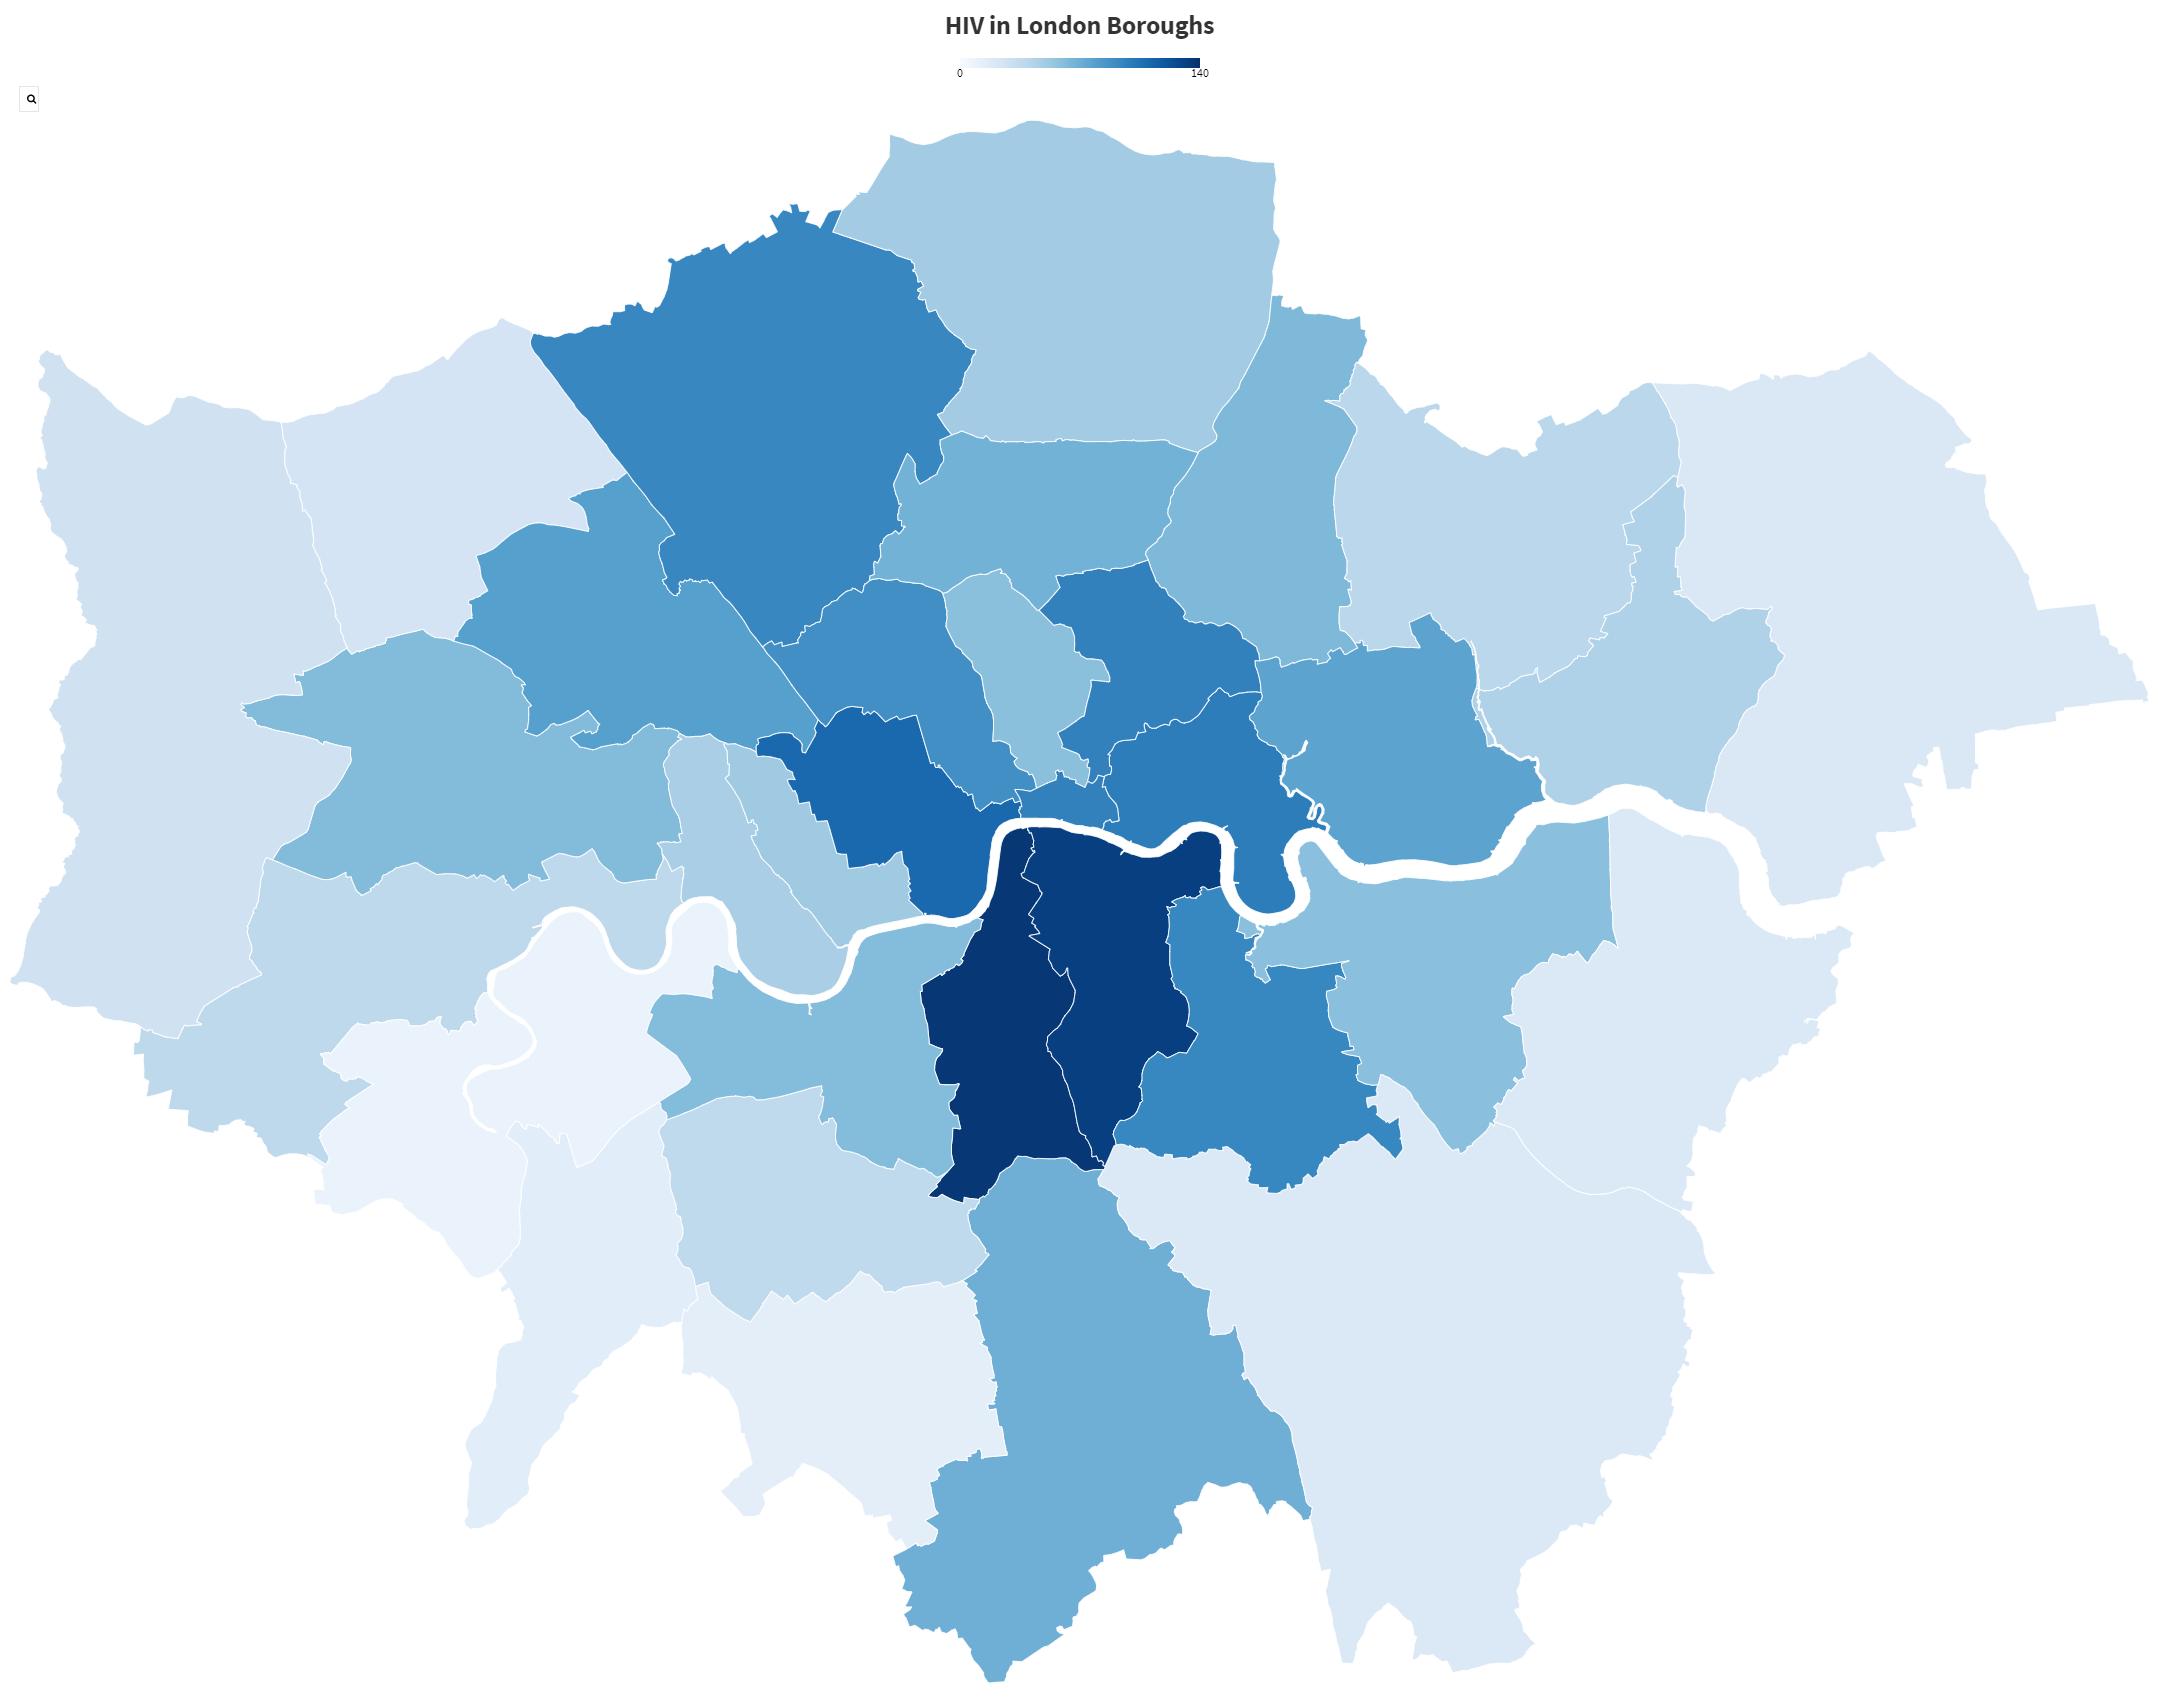 HIV Statistics London